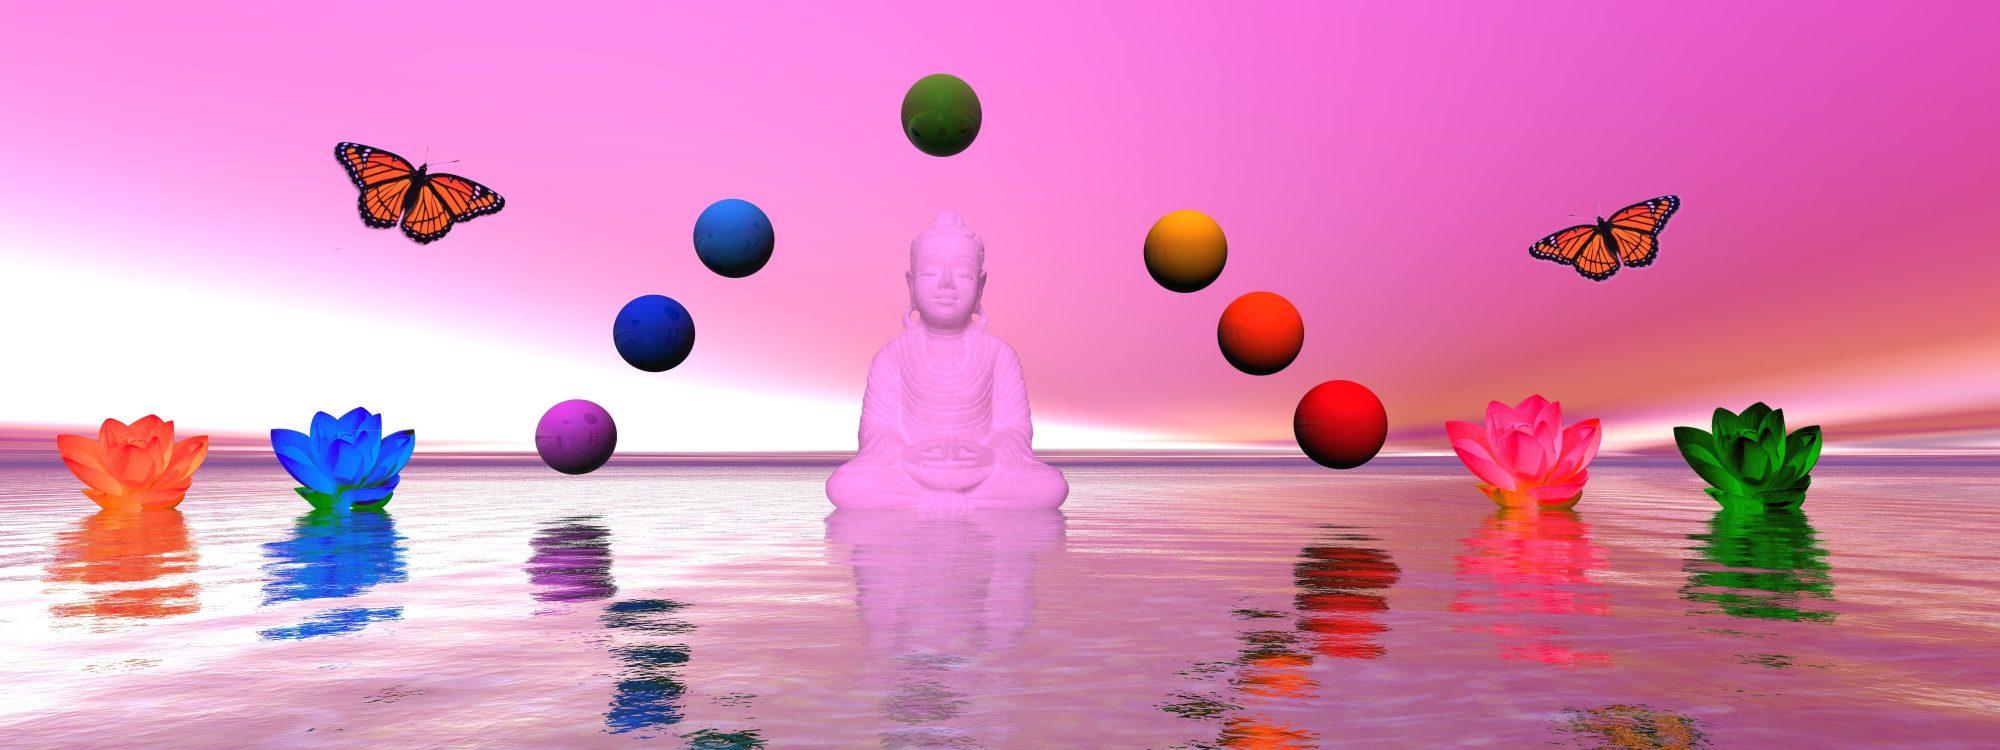 Calm and Balance